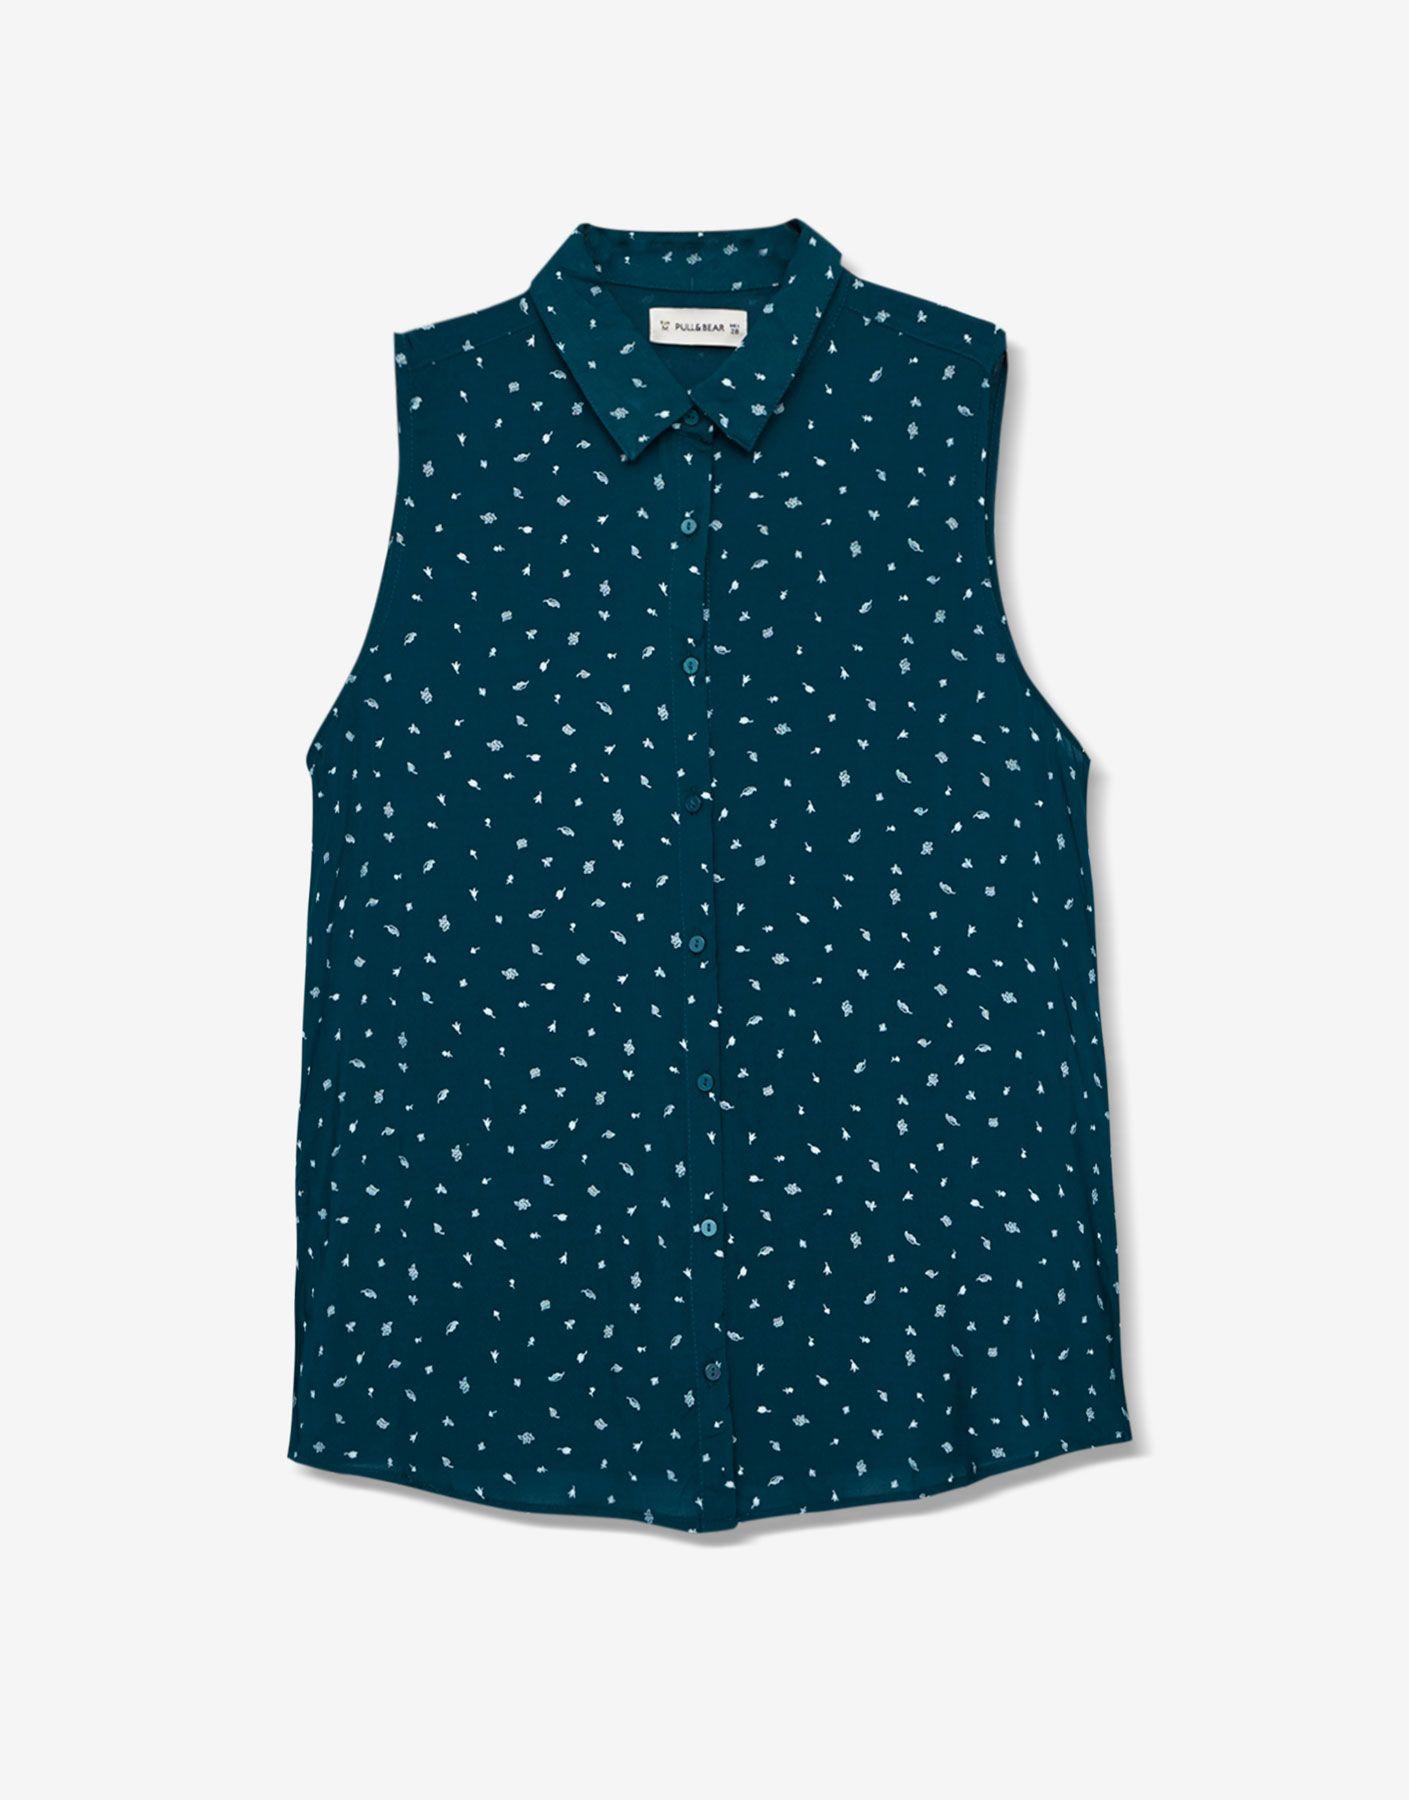 938d4e14ee Camisa estampada manga sisa - Blusas y camisas - Ropa - Mujer - PULL BEAR  México